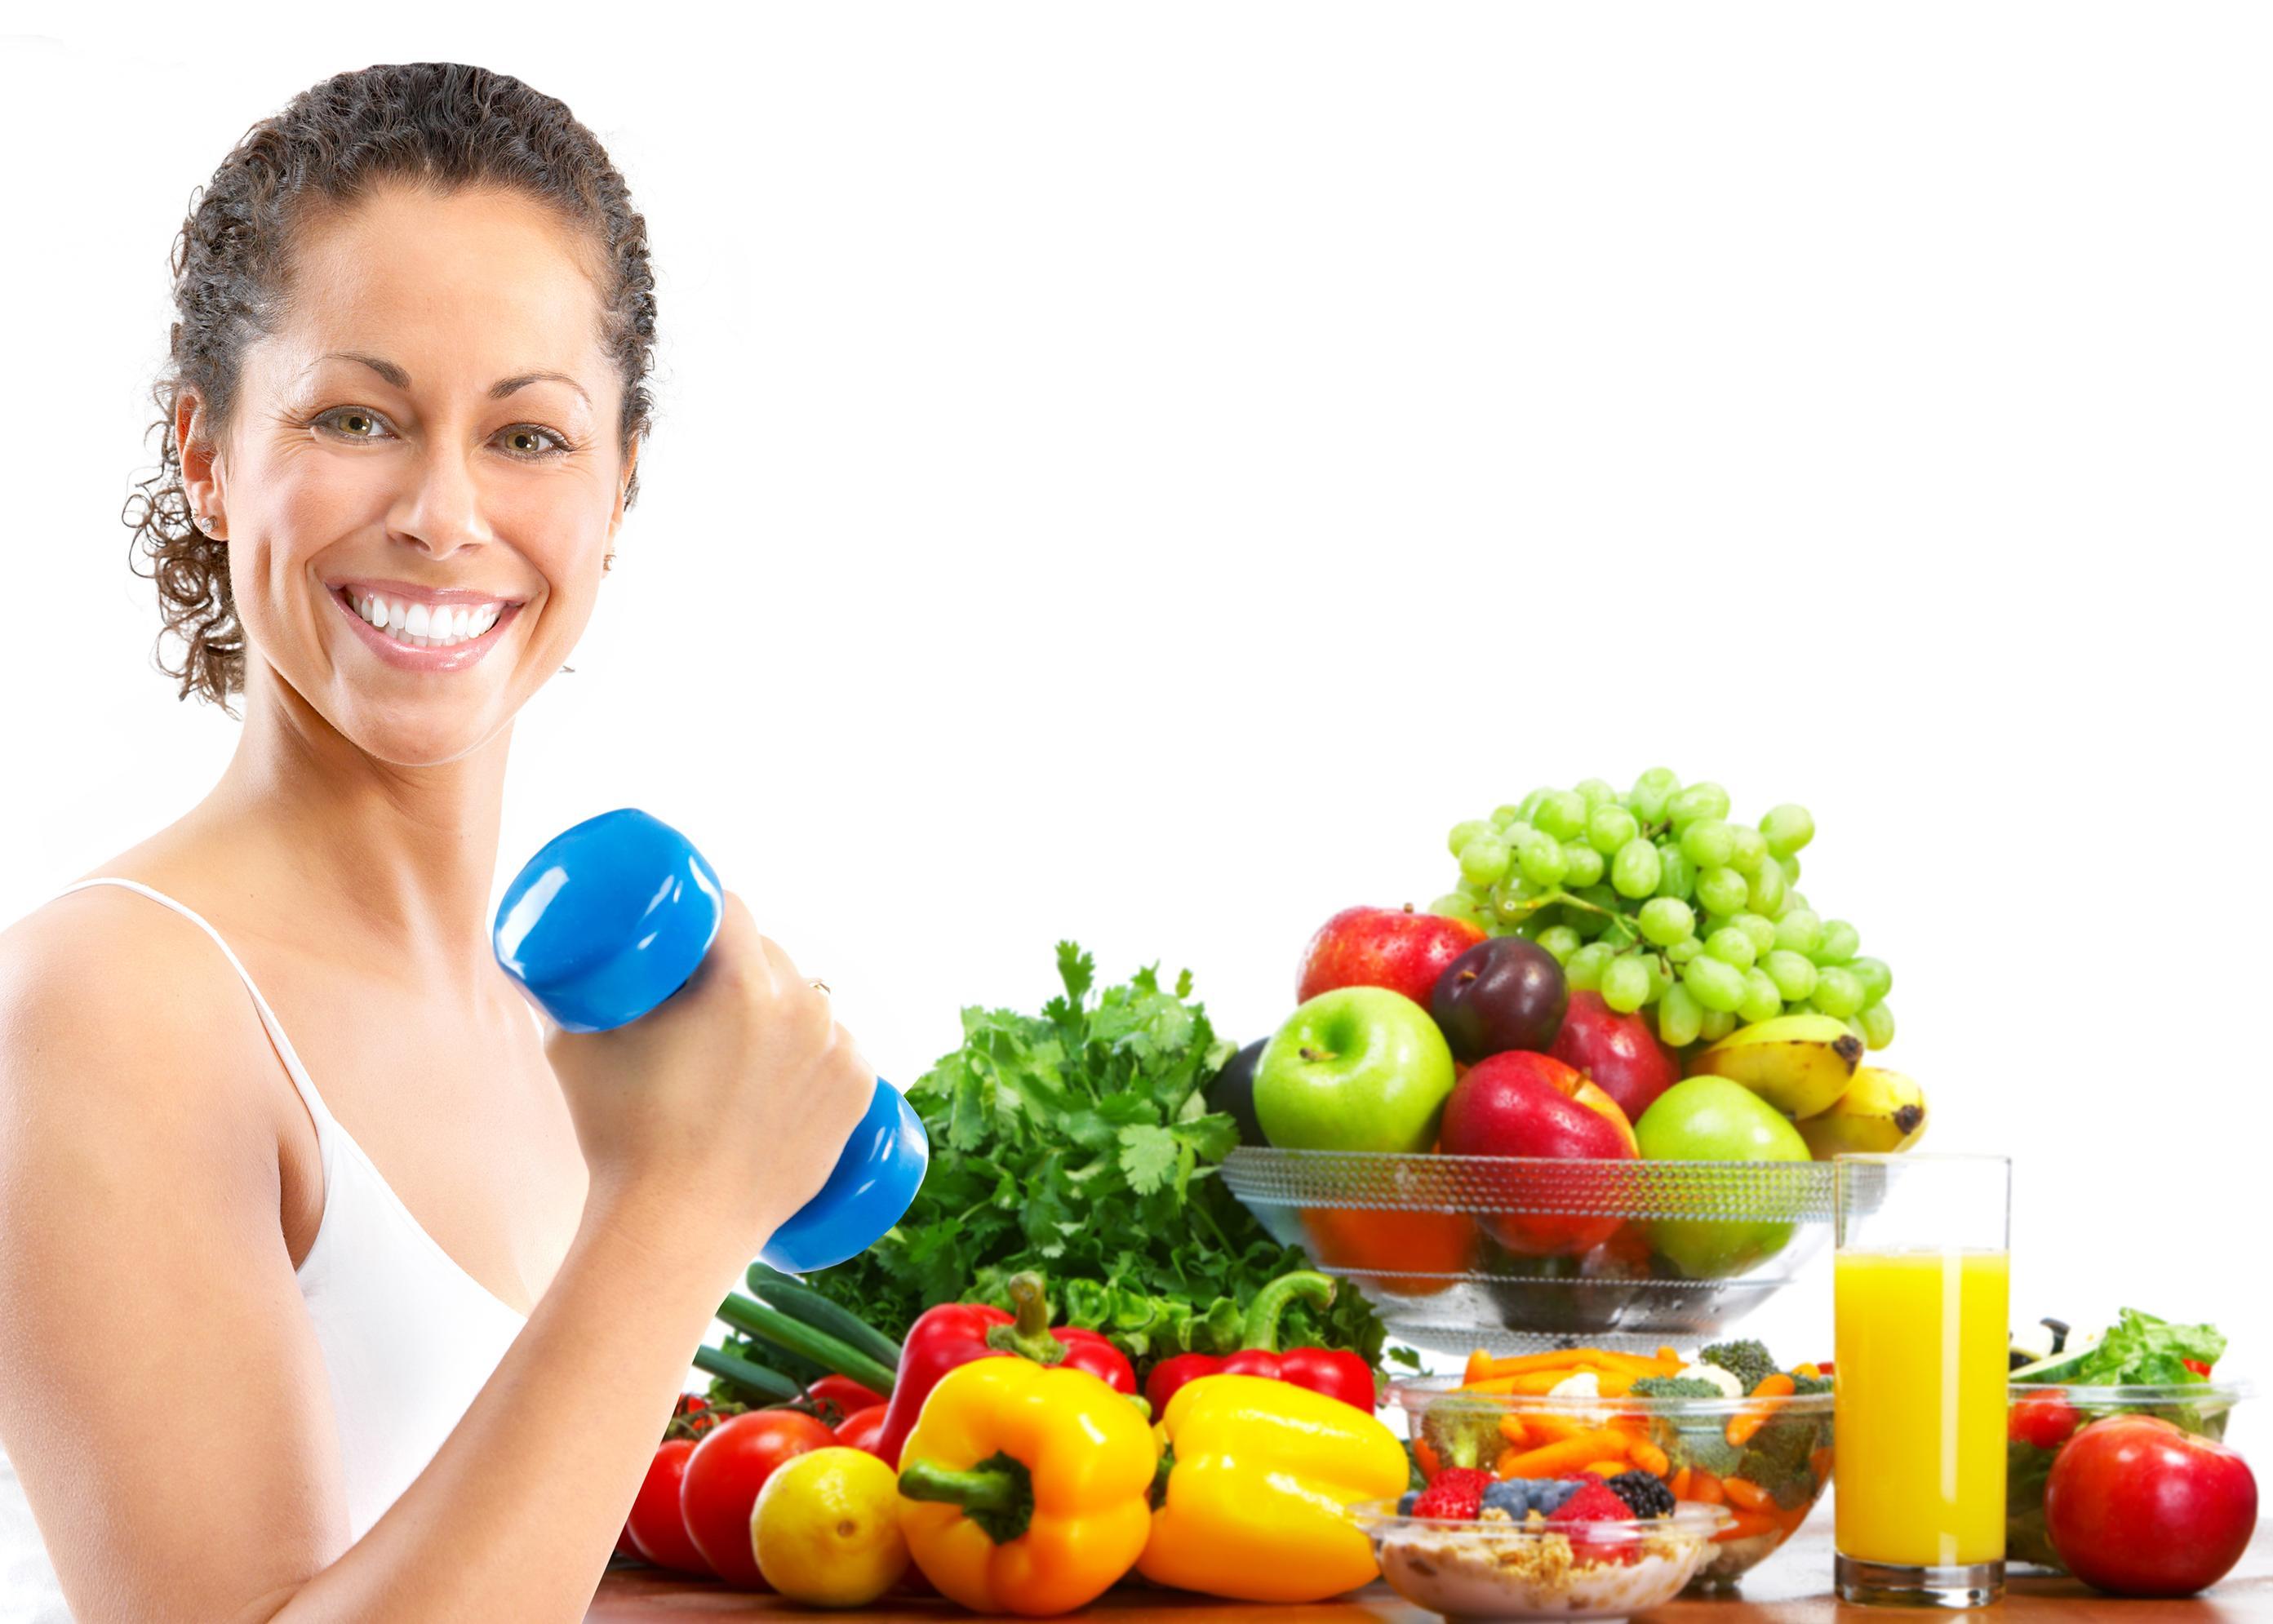 Health and Leisure Basics